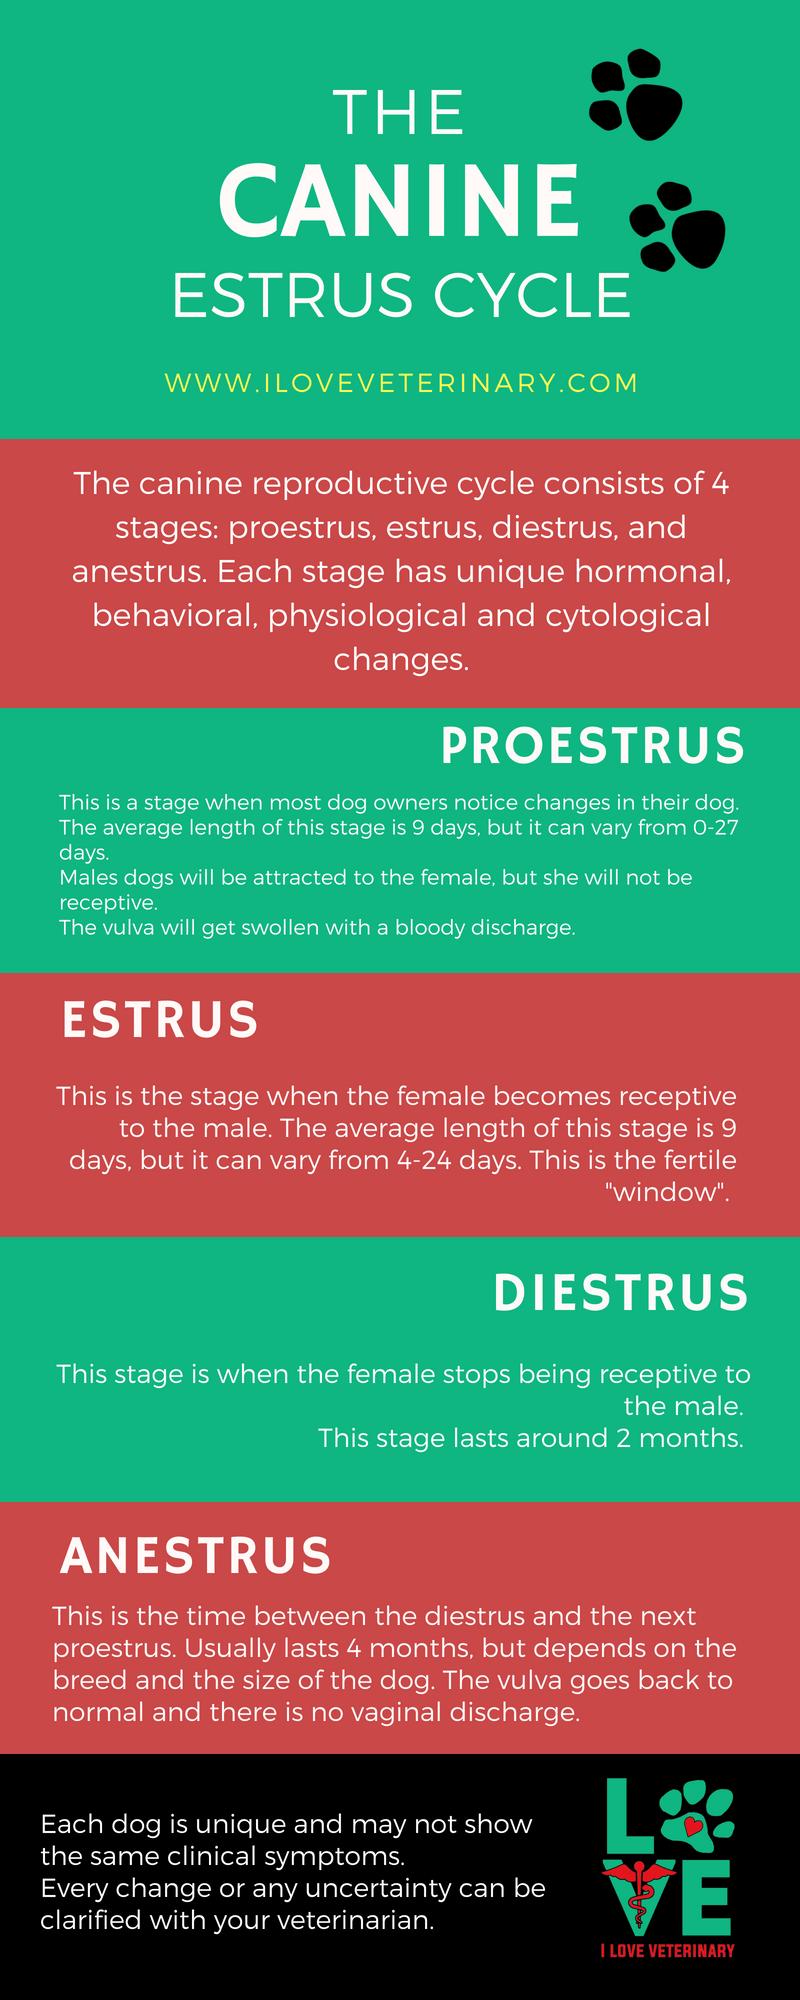 The Canine Estrus Cycle A Veterinary Infographic Vet Medicine Vet Tech Student Veterinary Tech